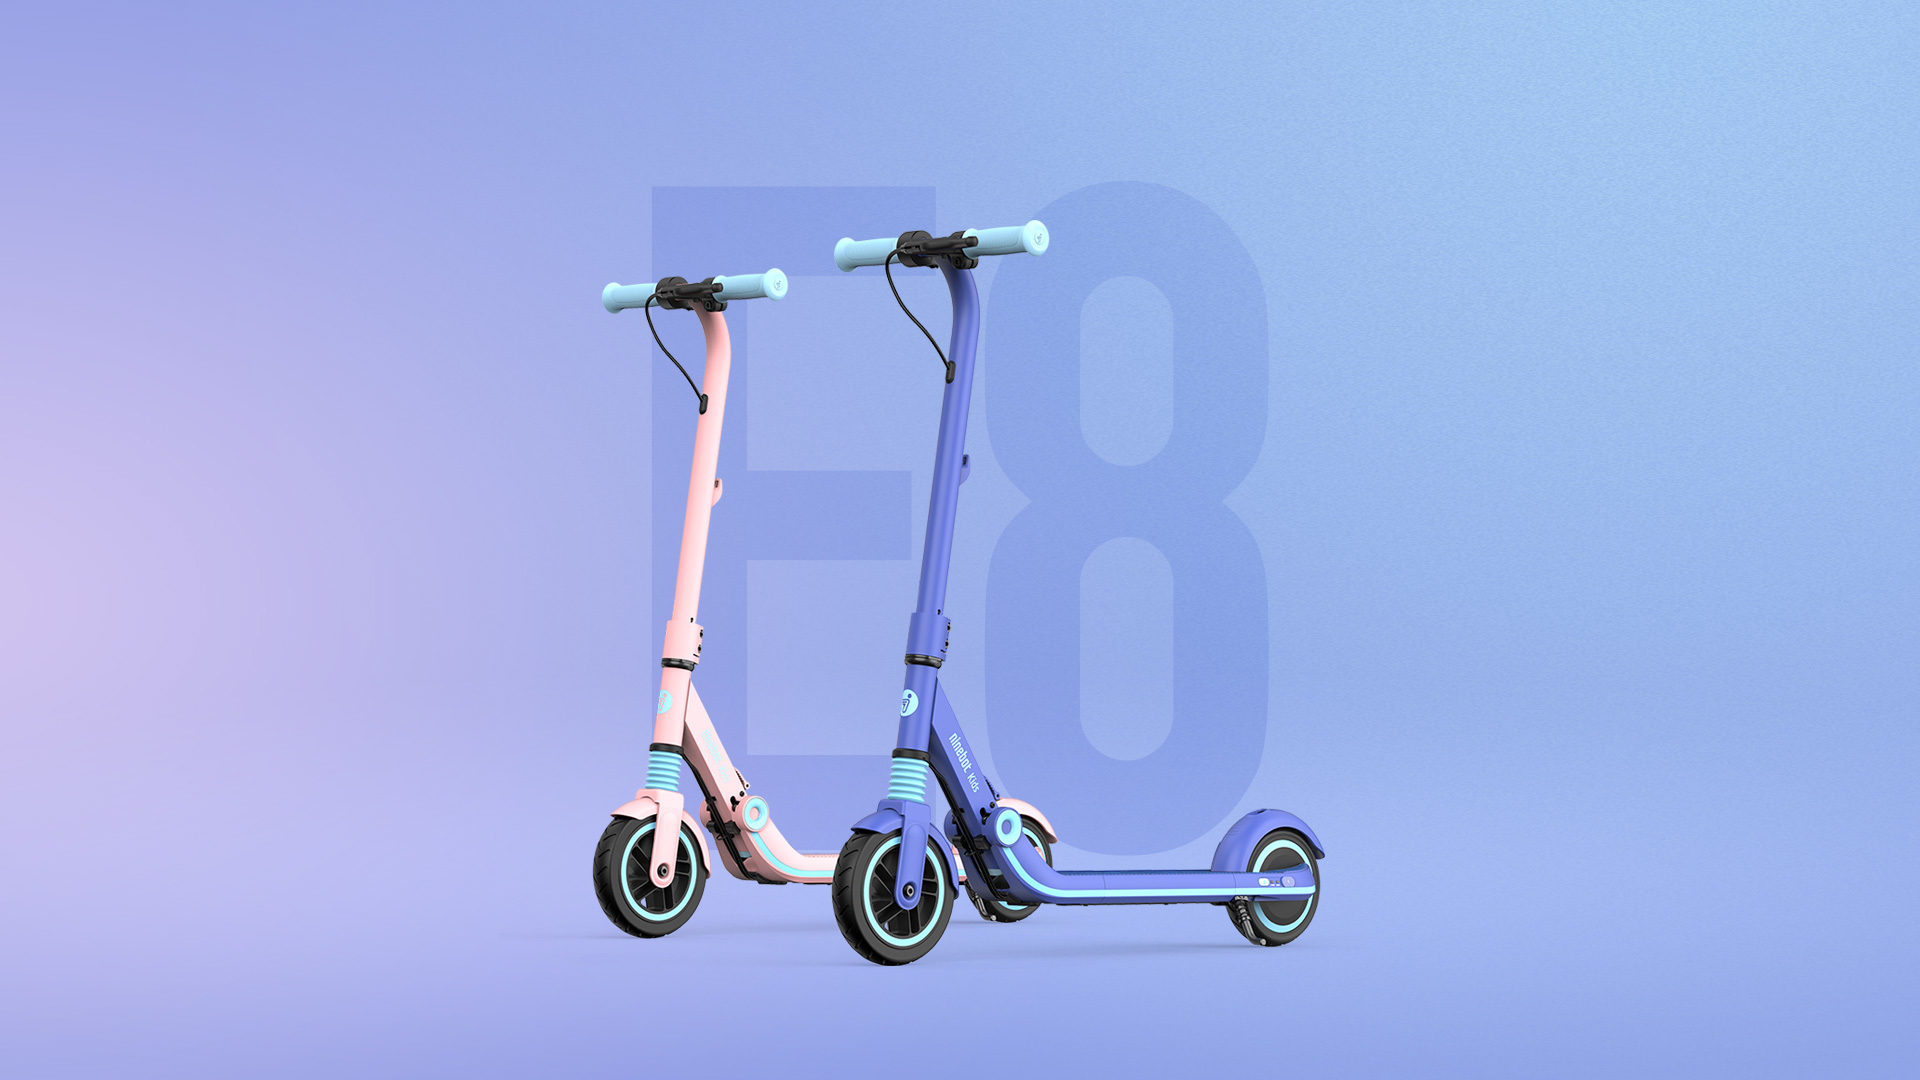 [hero] ZING E8, der eKickScooter für Youngsters!